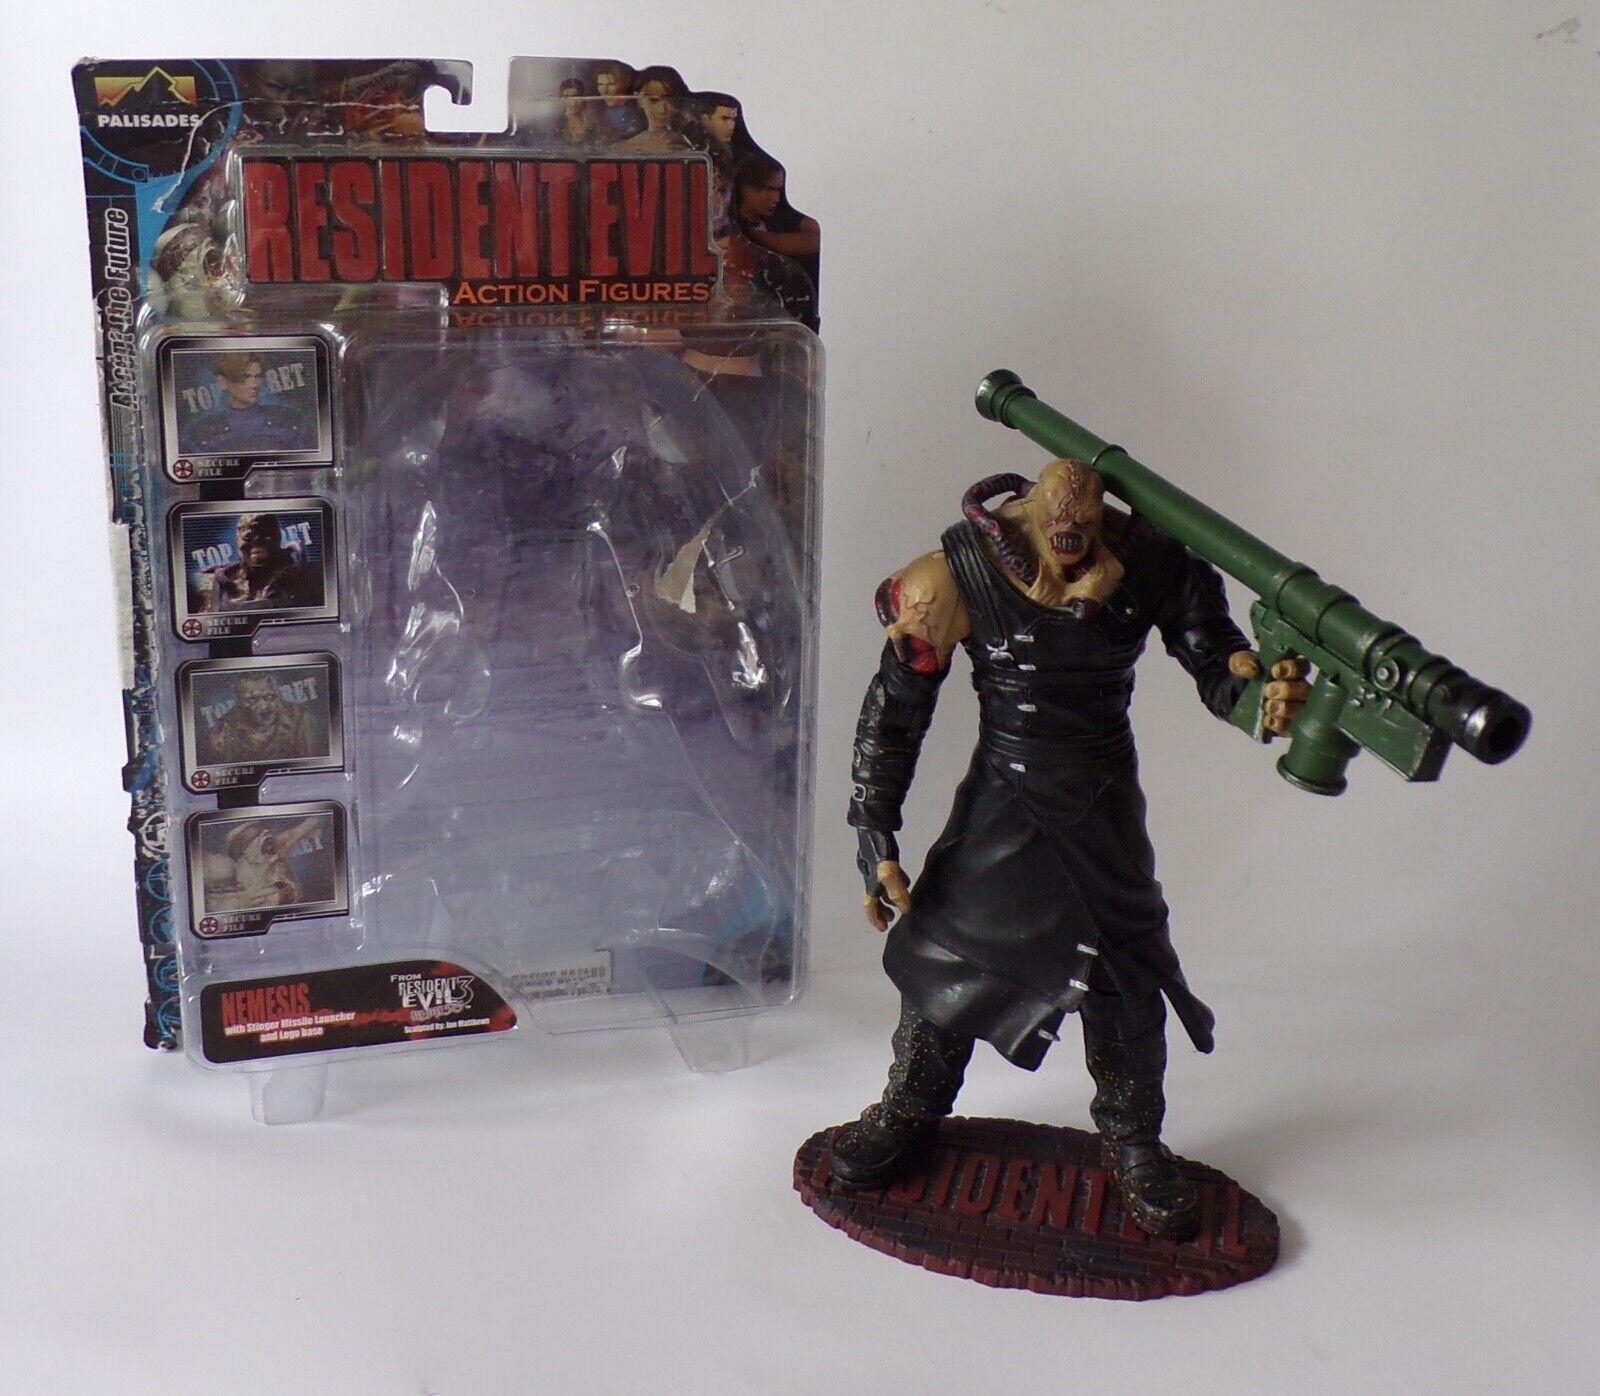 2001 Palisades Toys Resident Evil 3  Nemesis  Action Figure - Horror Video Game